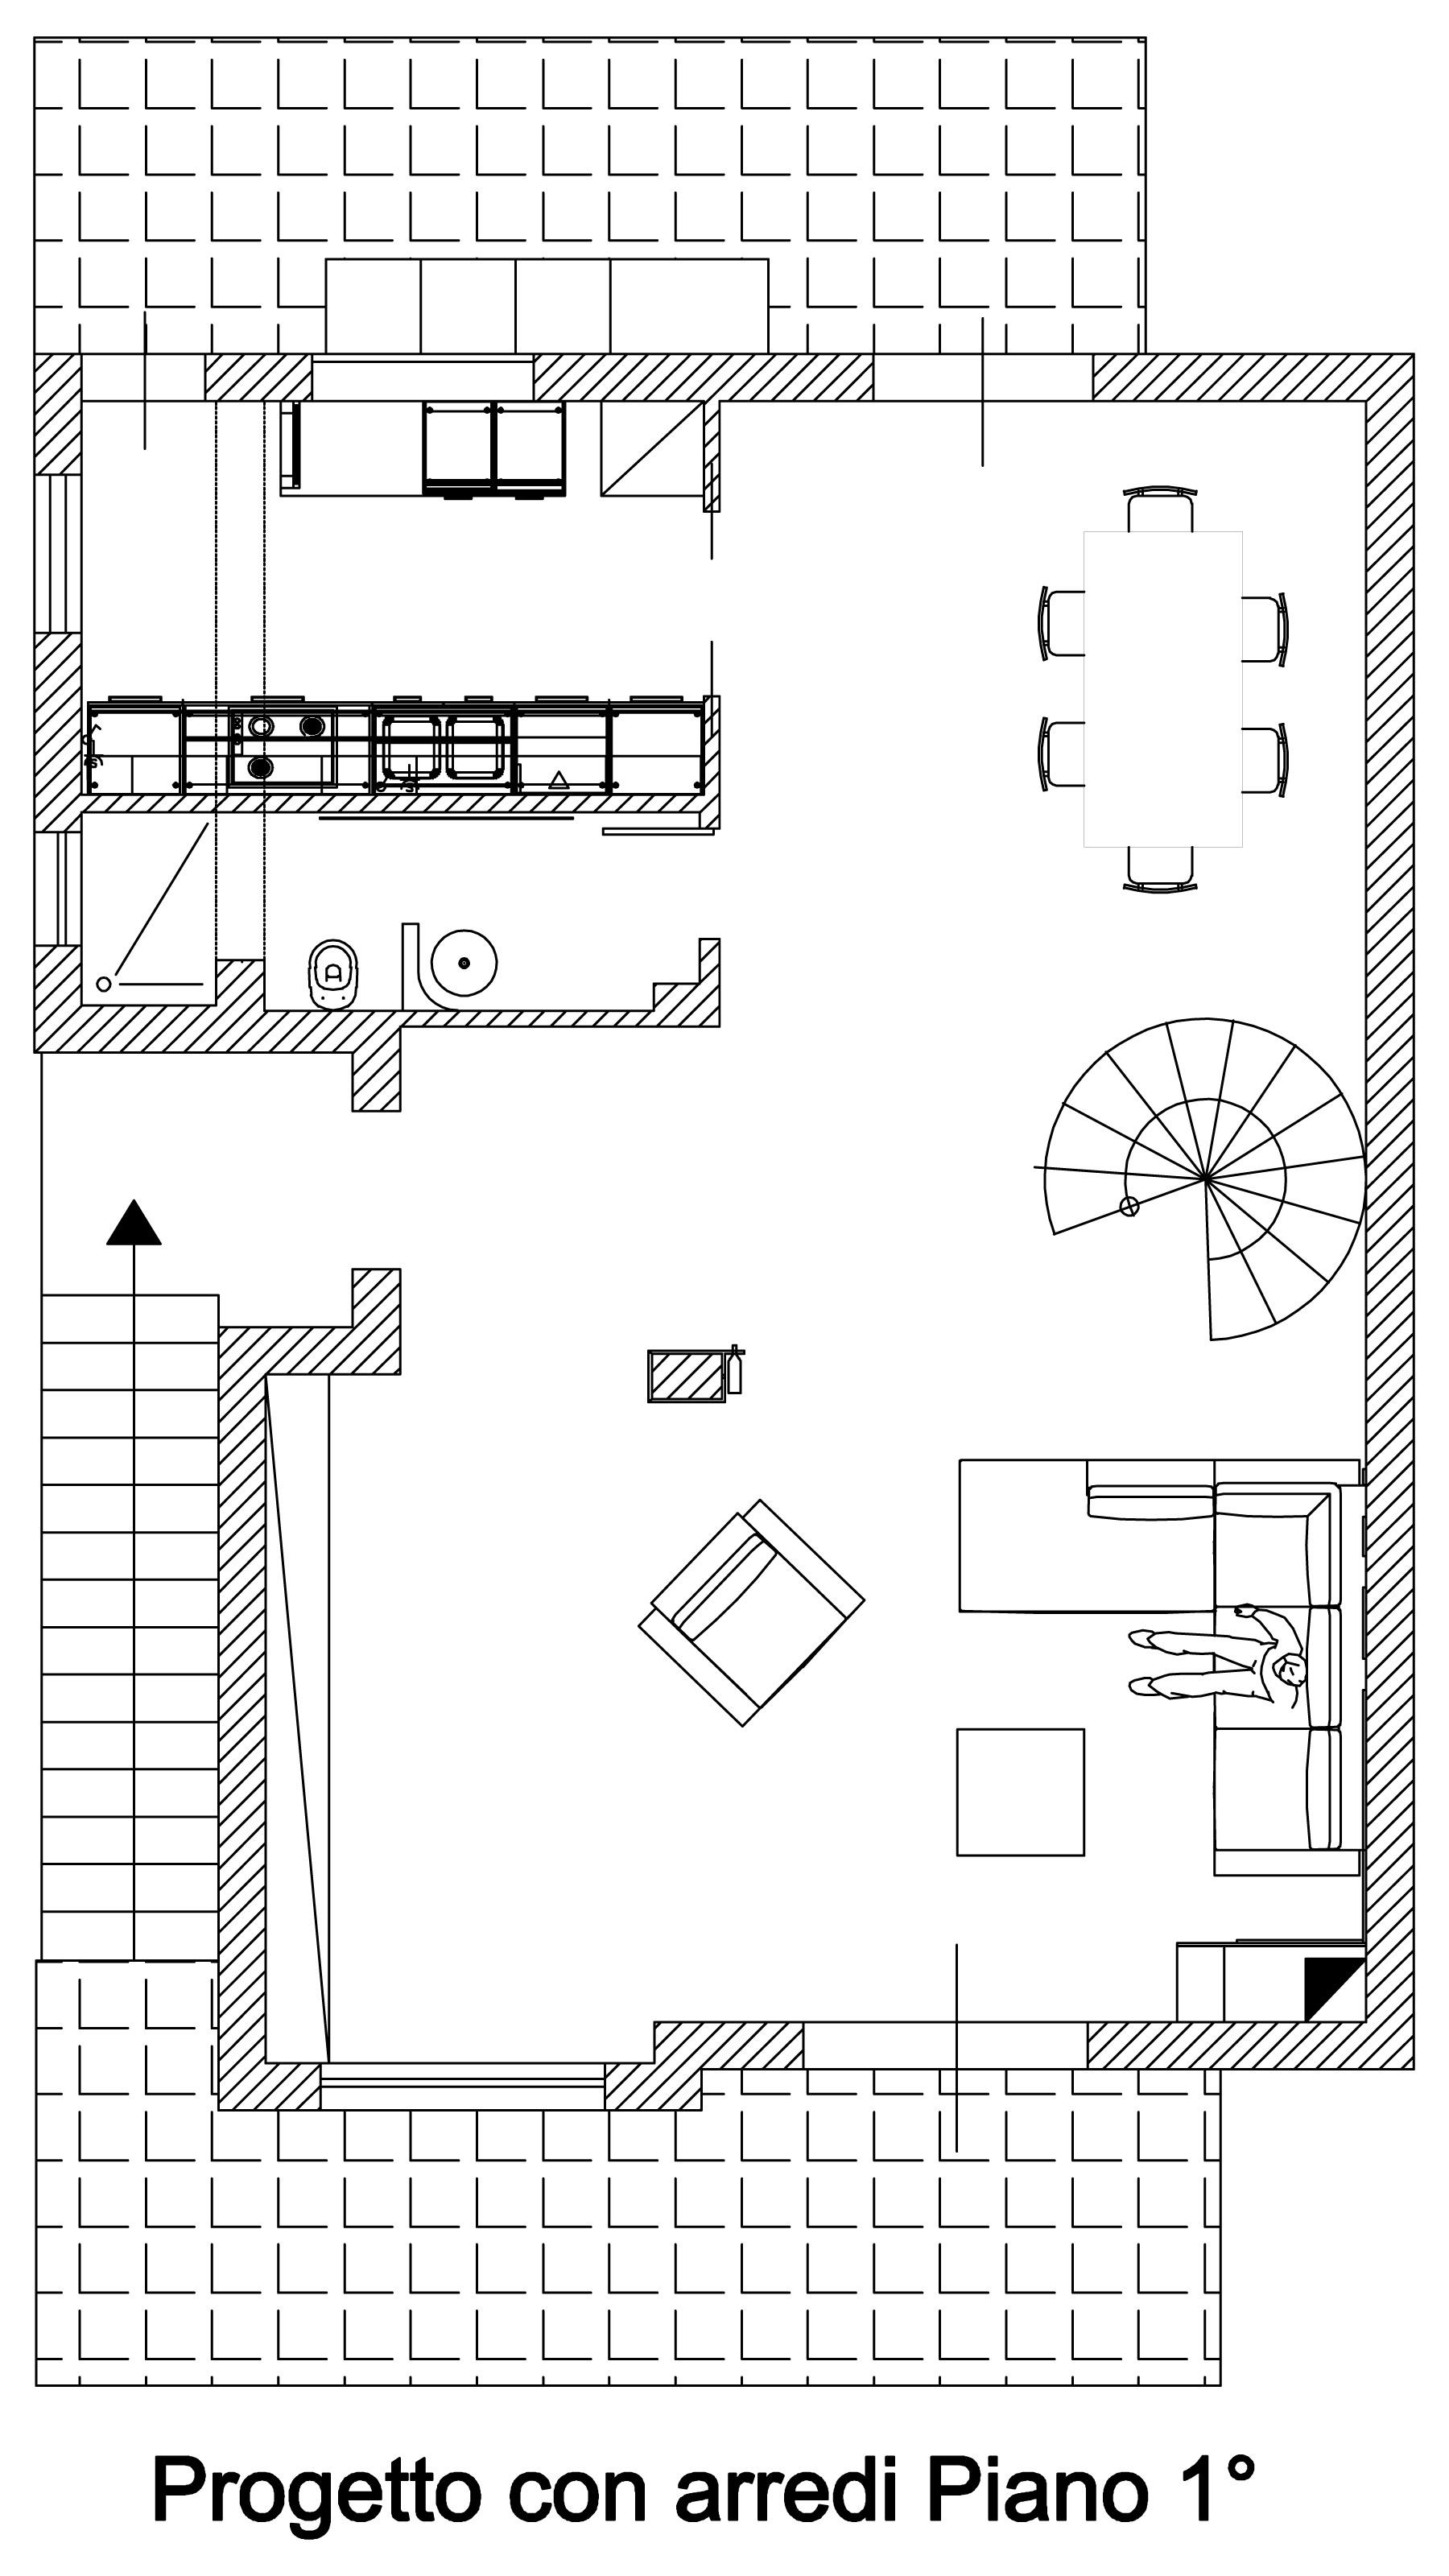 arco-arnone-interior-diseño-de-unabitazione-de-2-niveles del piso primero